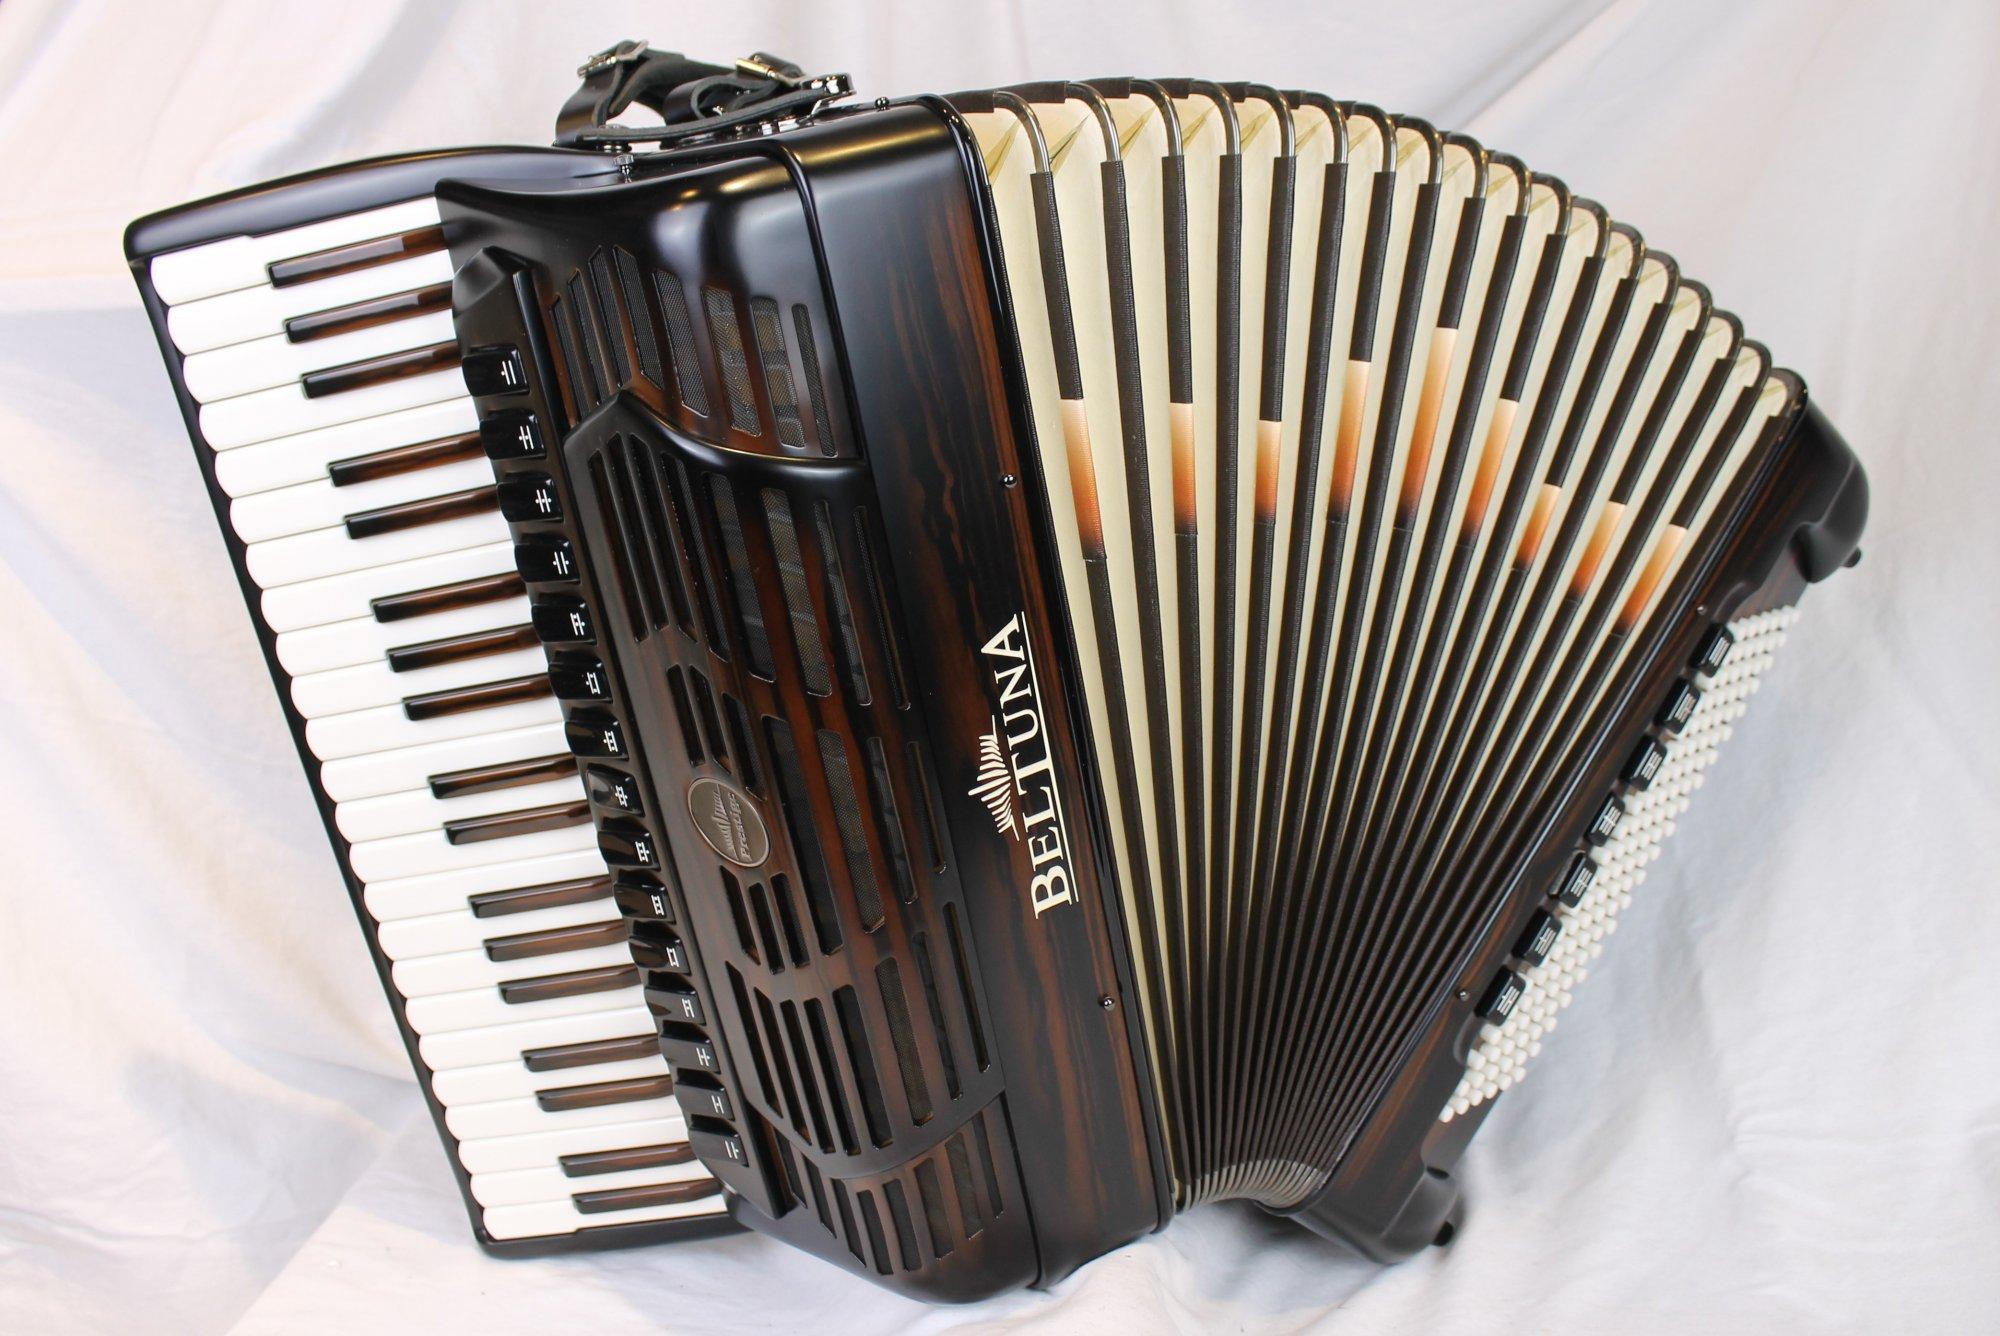 NEW Ebony Beltuna Prestige V Special Piano Accordion LMMMH 41 120